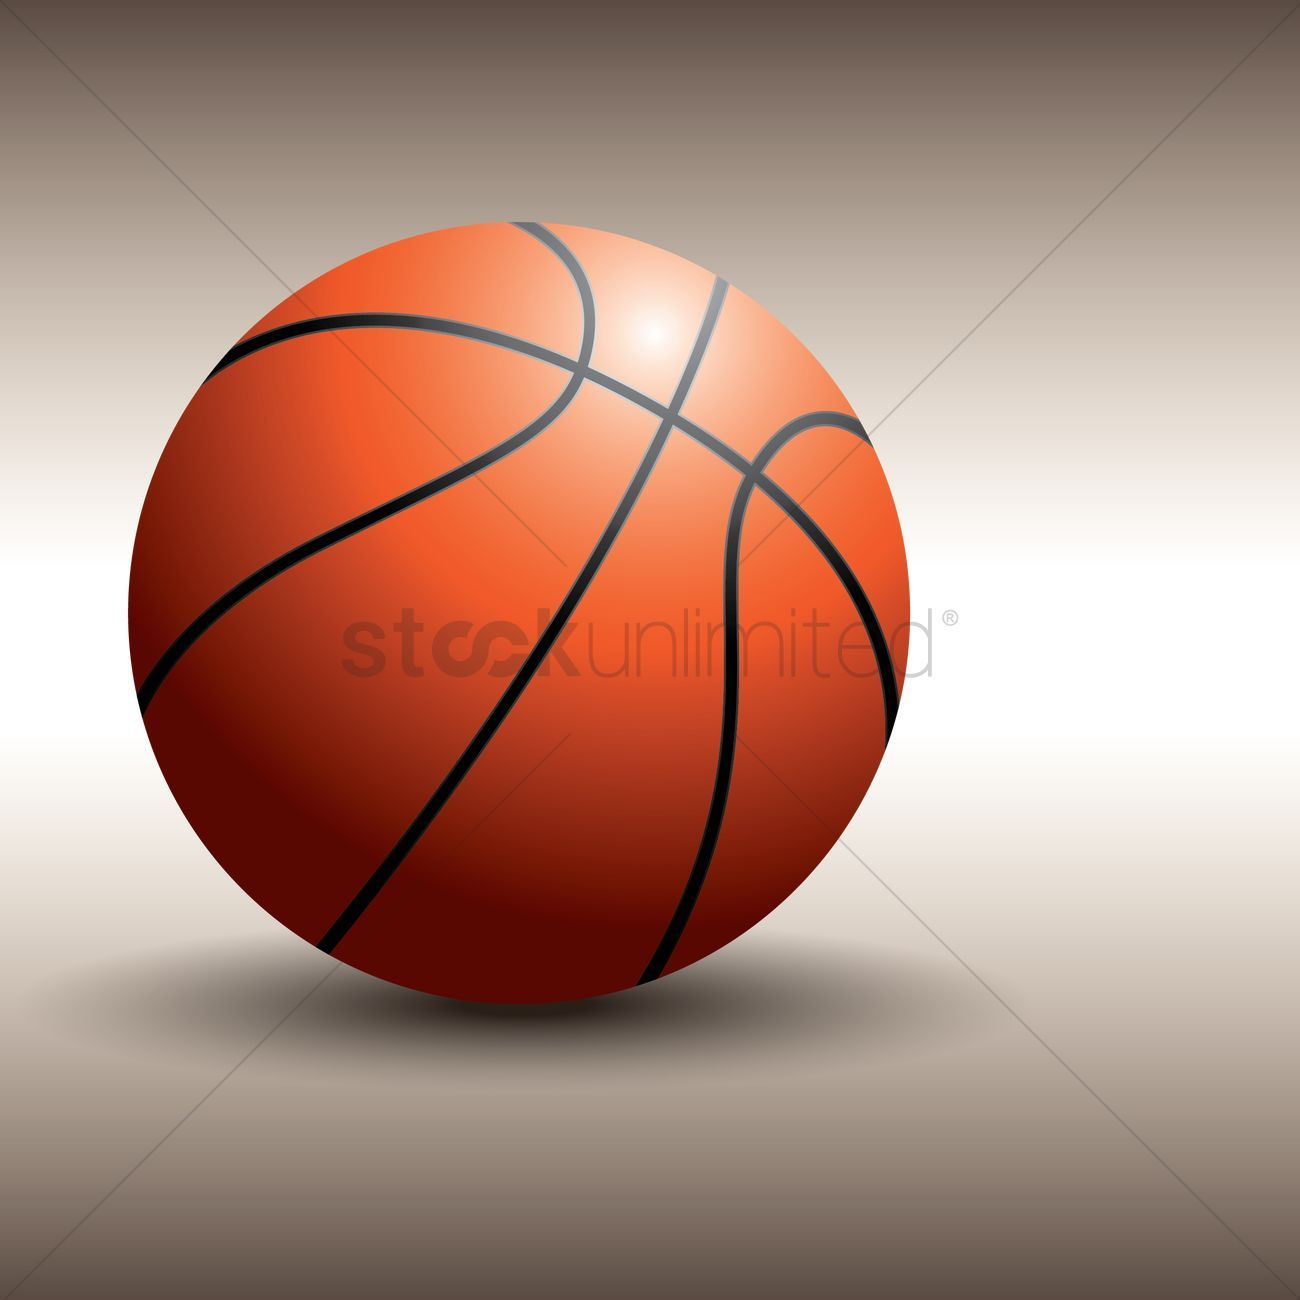 Basketball Vectors Stock Clipart Sponsored Vectors Basketball Clipart Stock Affiliate Law Logo